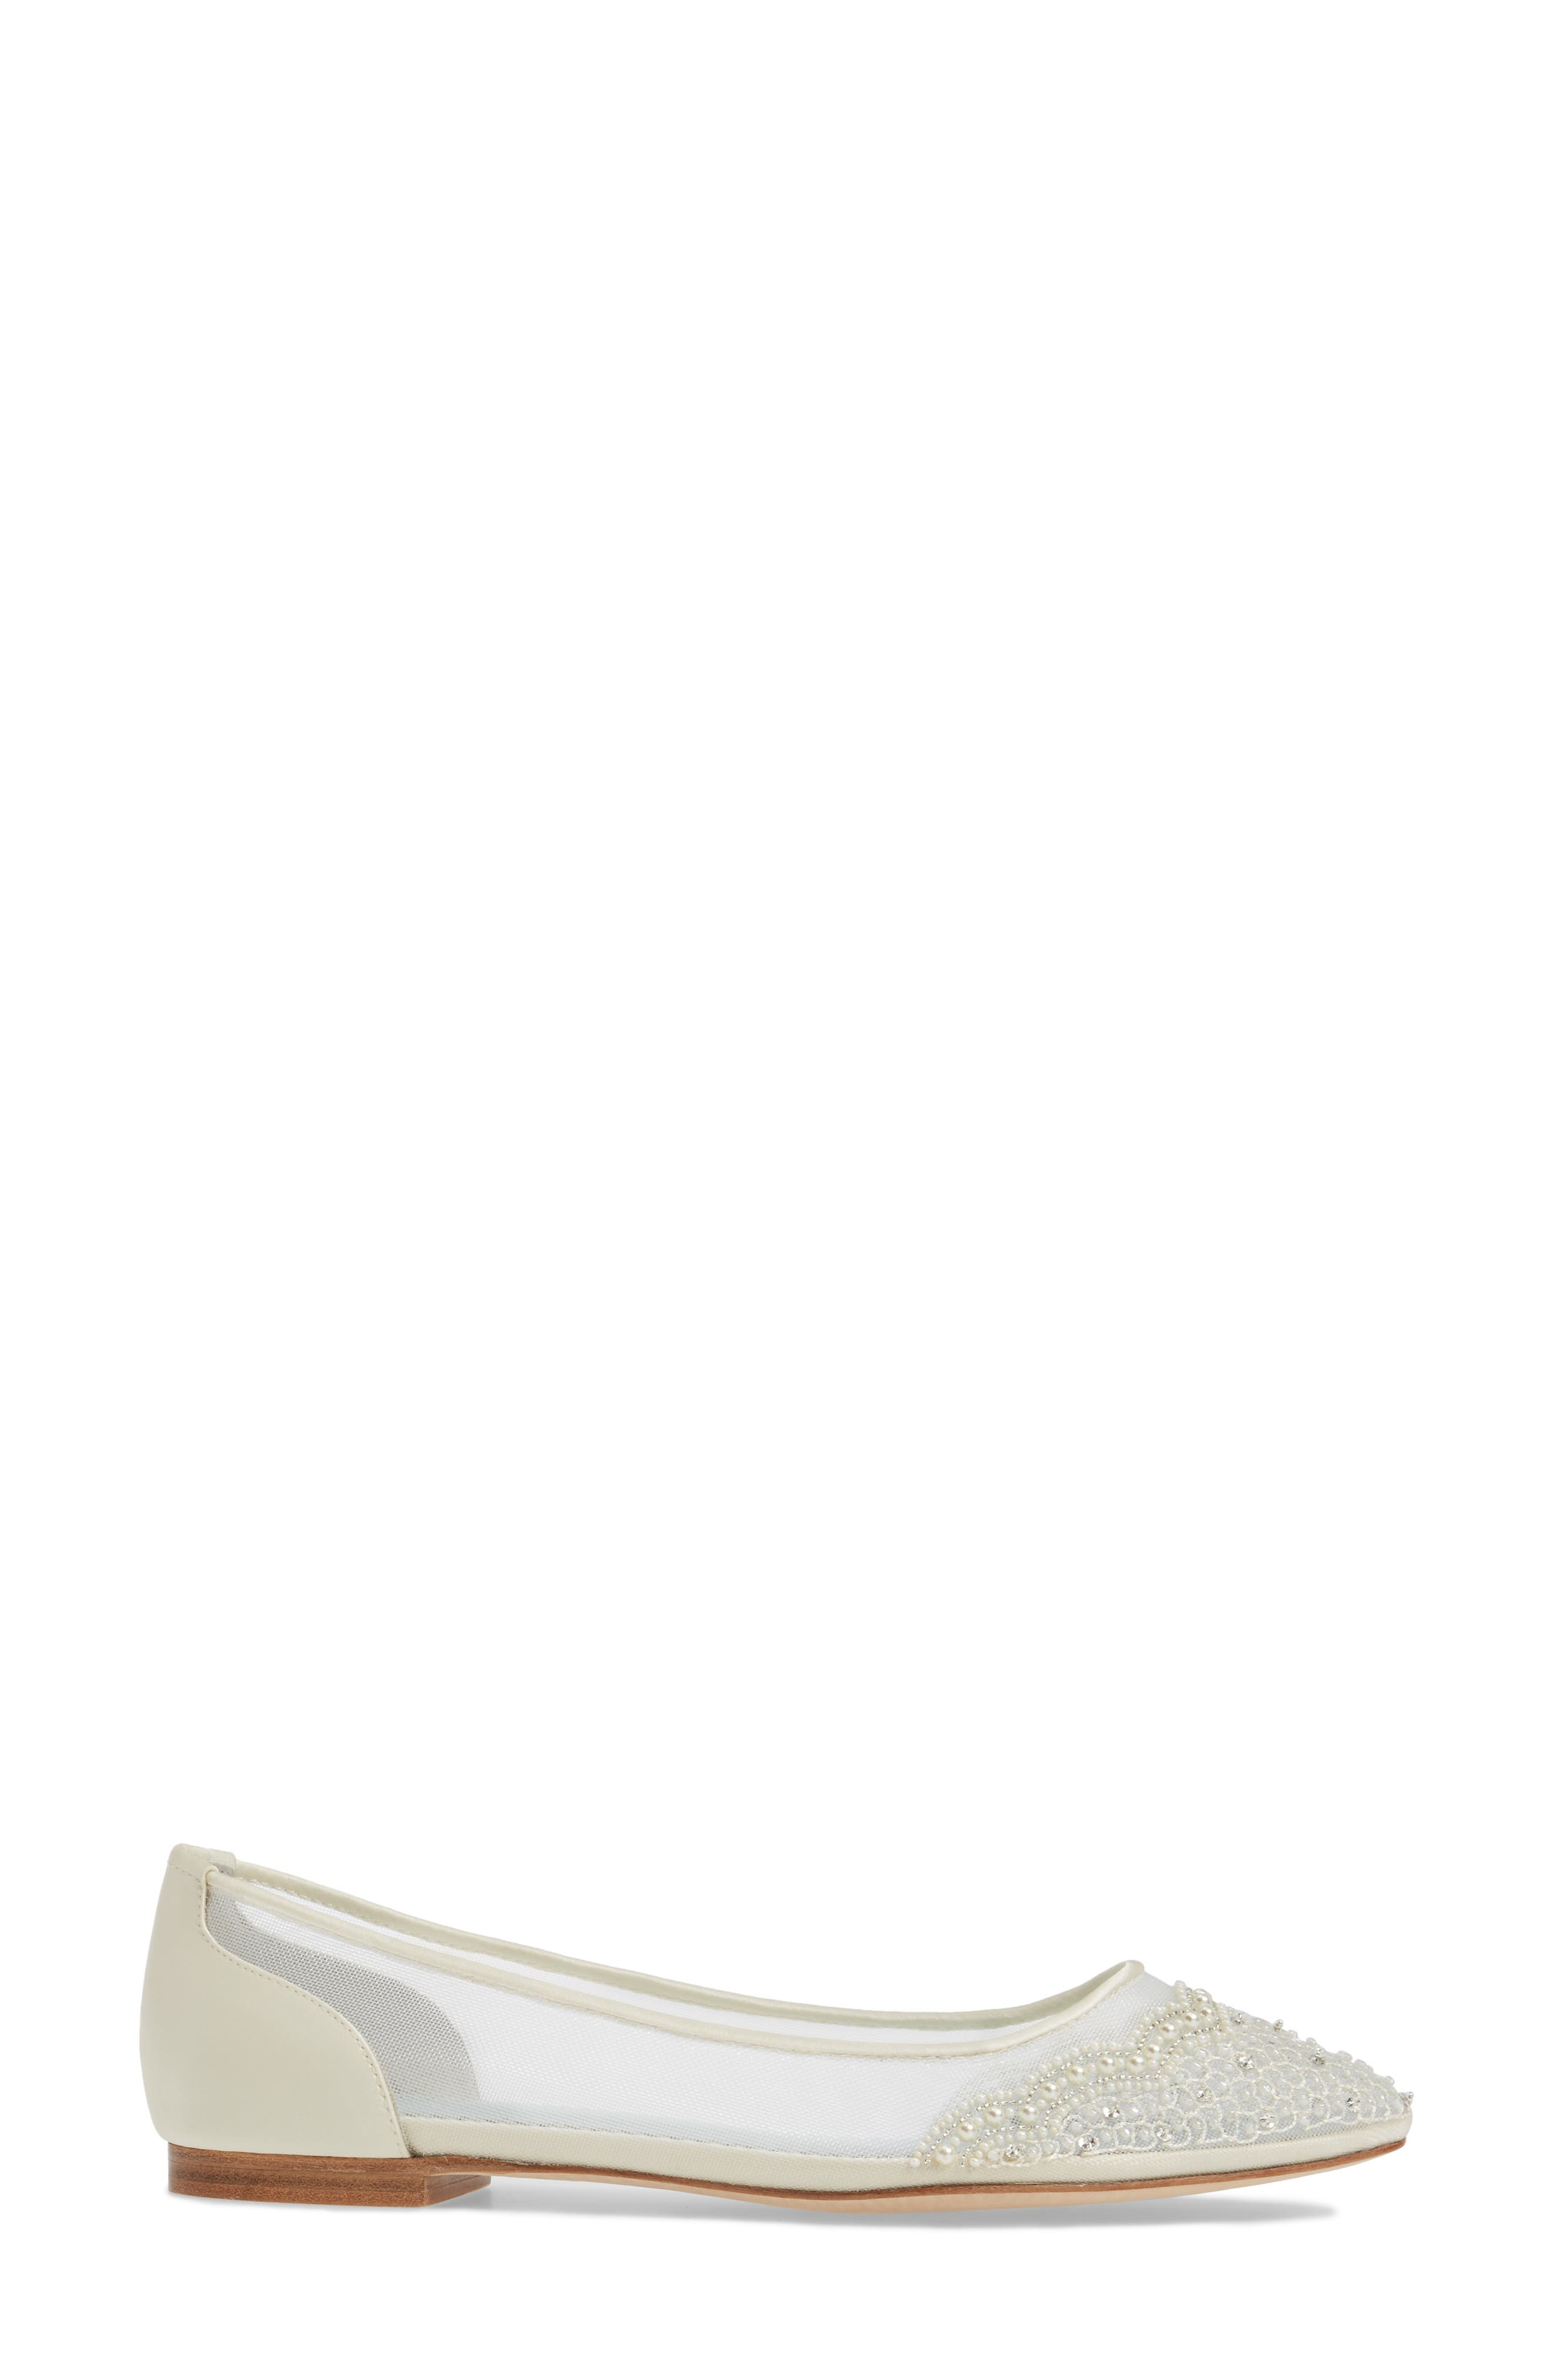 BELLA BELLE, Hailey Skimmer Flat, Alternate thumbnail 3, color, IVORY FABRIC